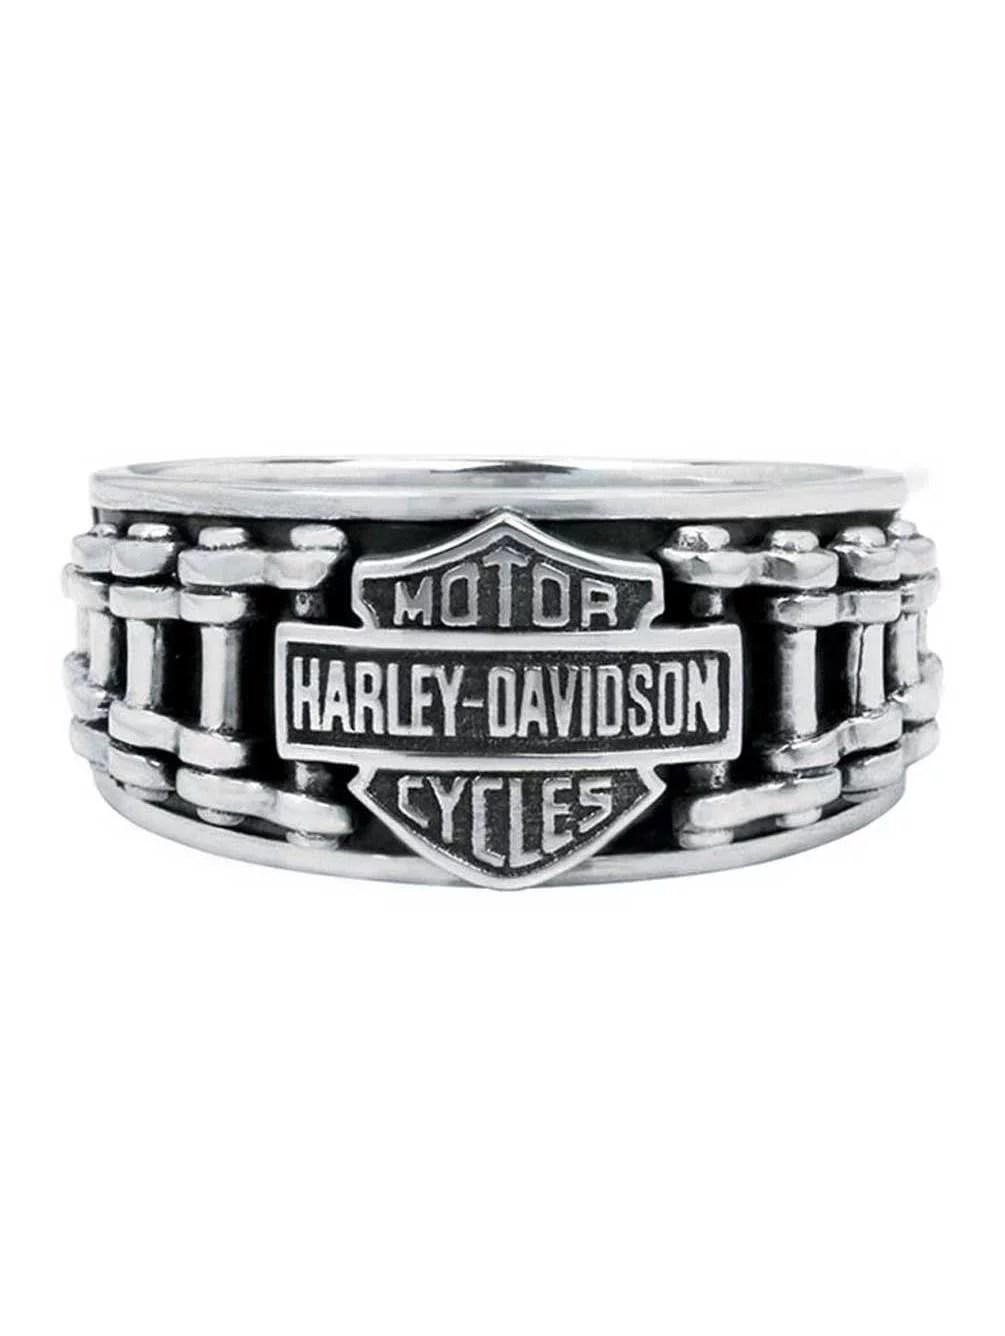 Harley Davidson Jewelry Rings : harley, davidson, jewelry, rings, Harley-Davidson, Men's, Rings, Walmart.com